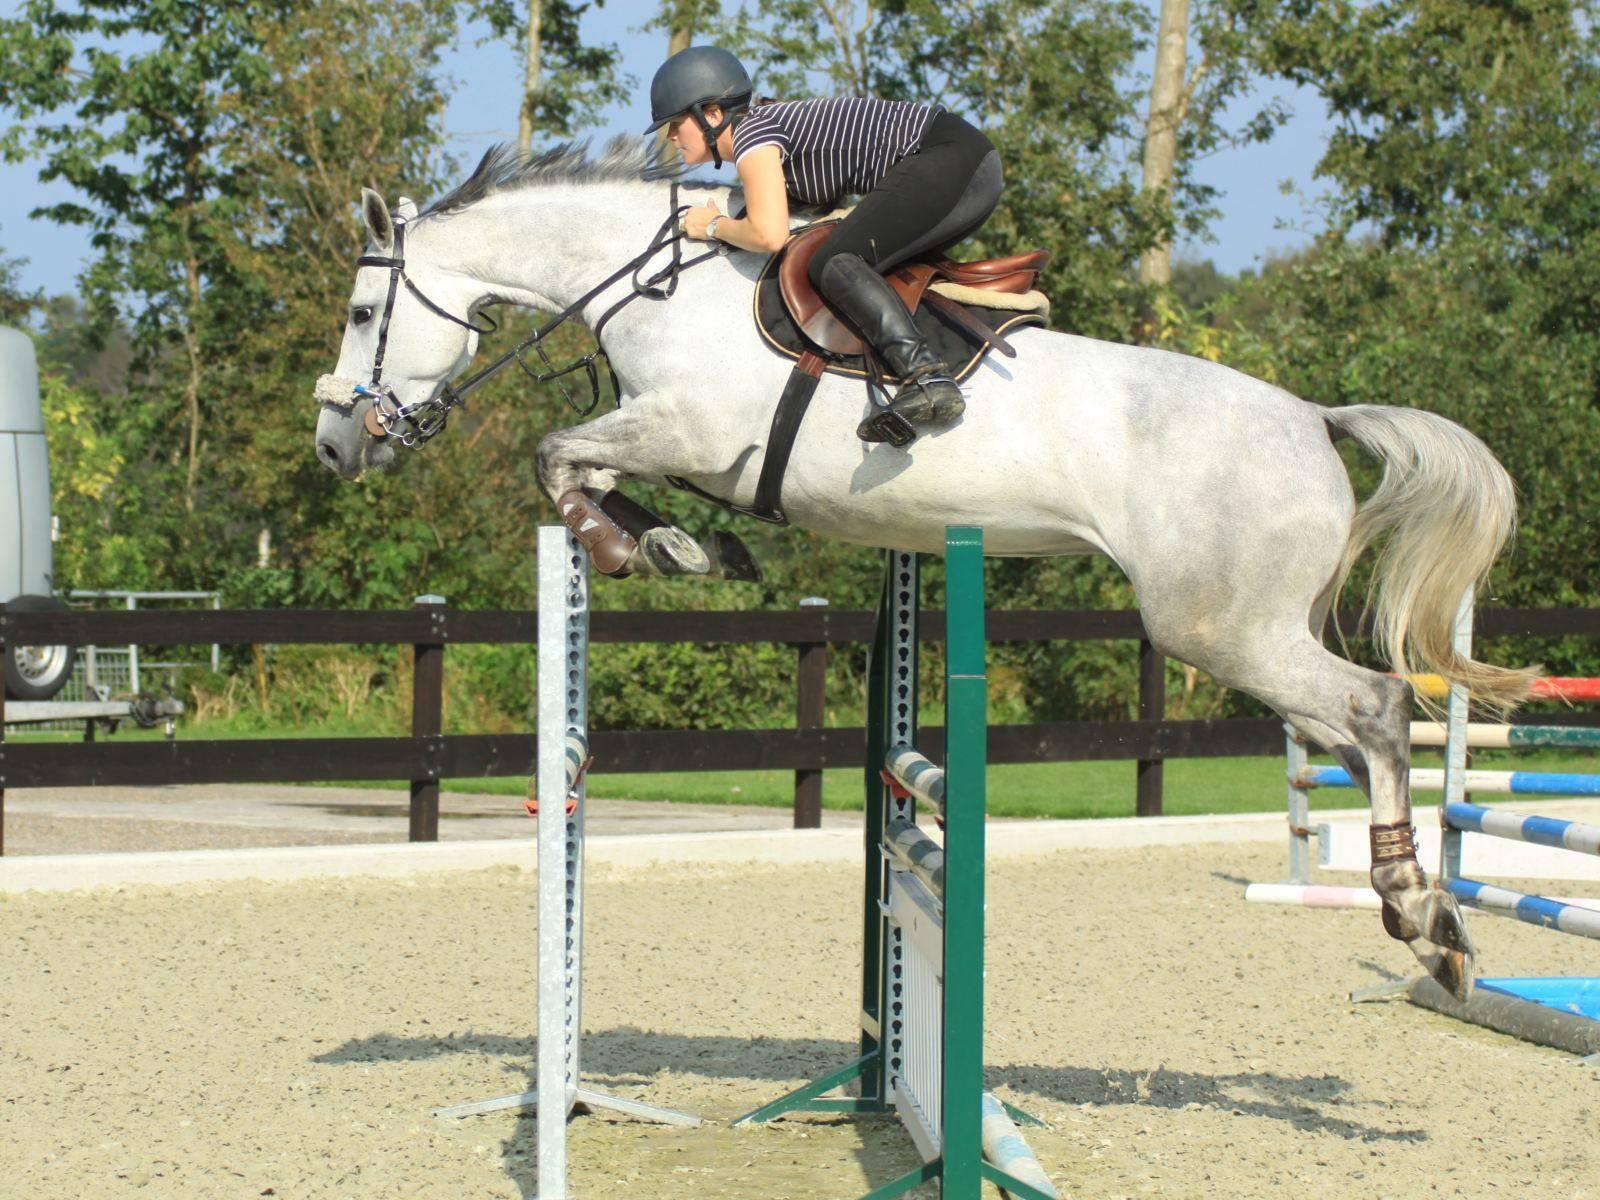 Jumping Horses for Sale UAE Qatar